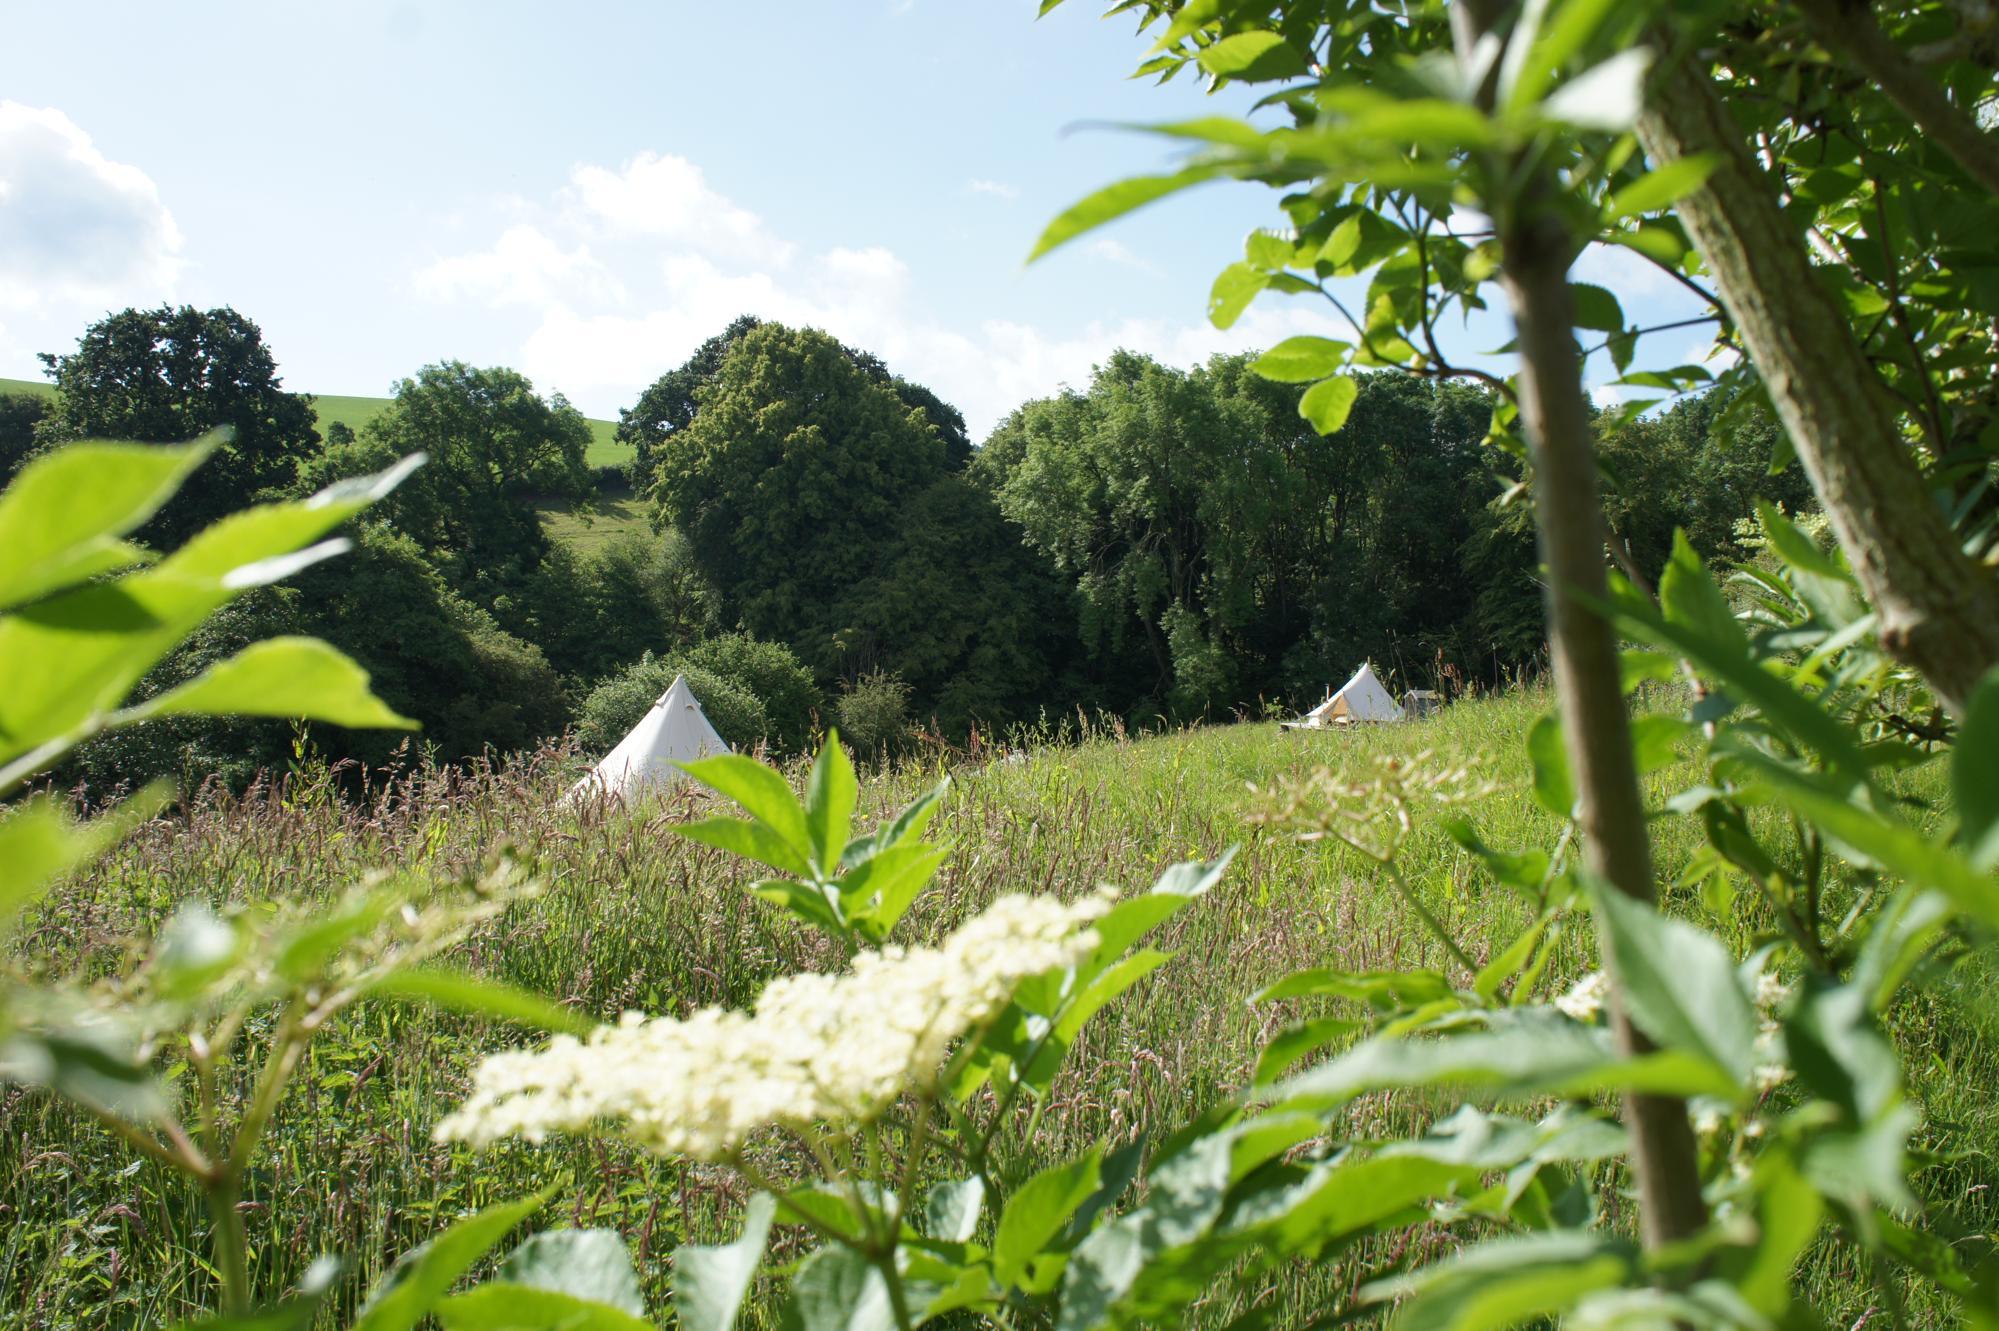 Glamping in Tenbury Wells – Cool Camping